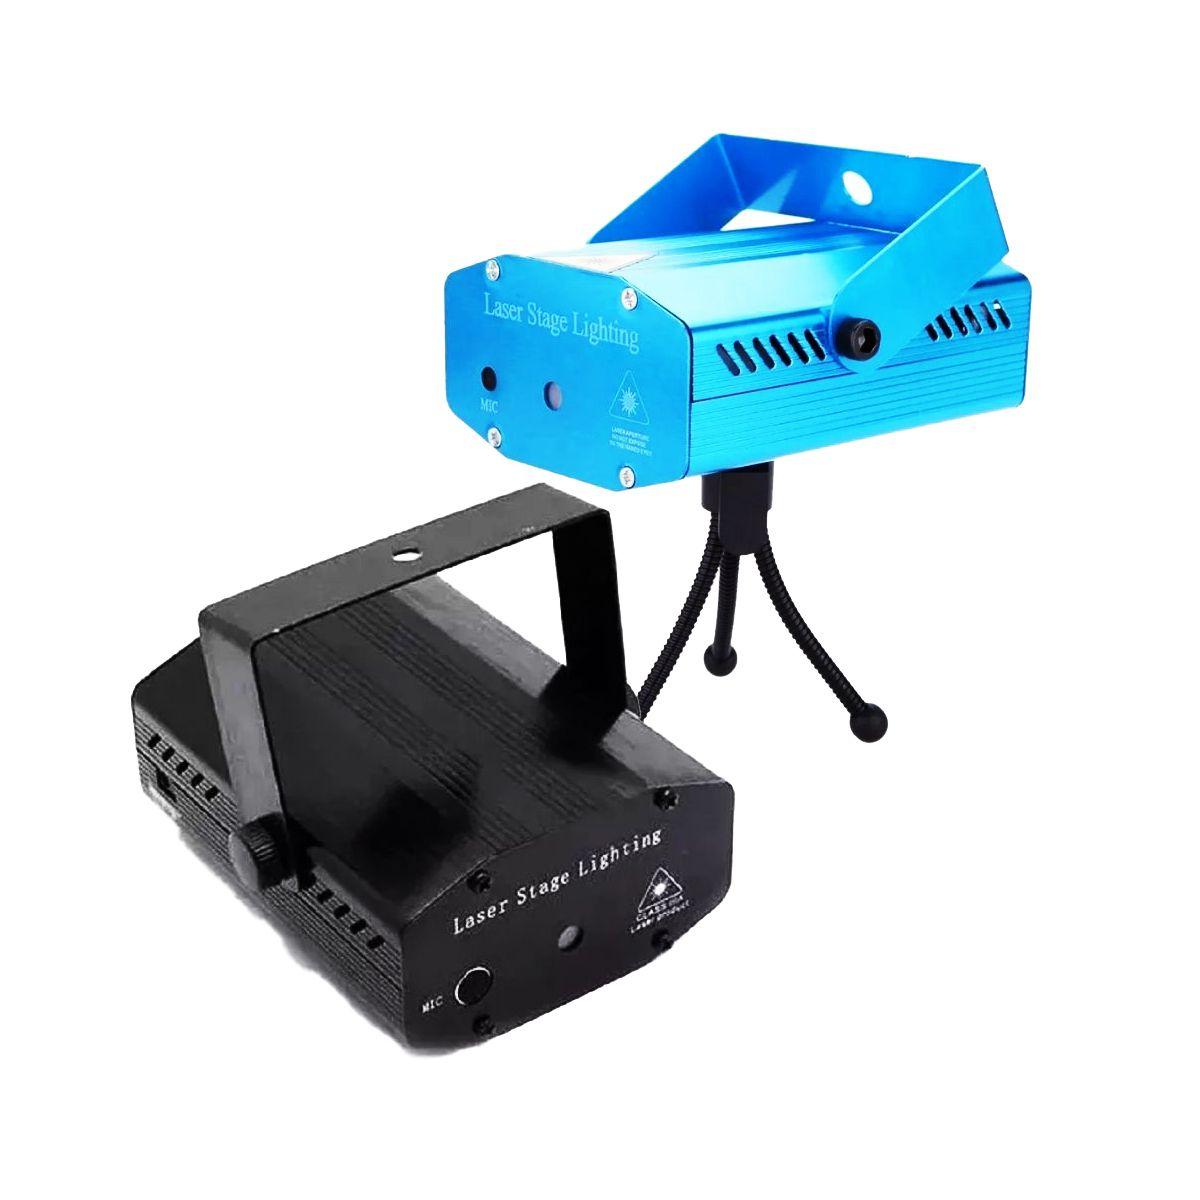 Mini Laser Projetor Holográfico Stage Lighting Azul E Preto - SD-09 E SD-08